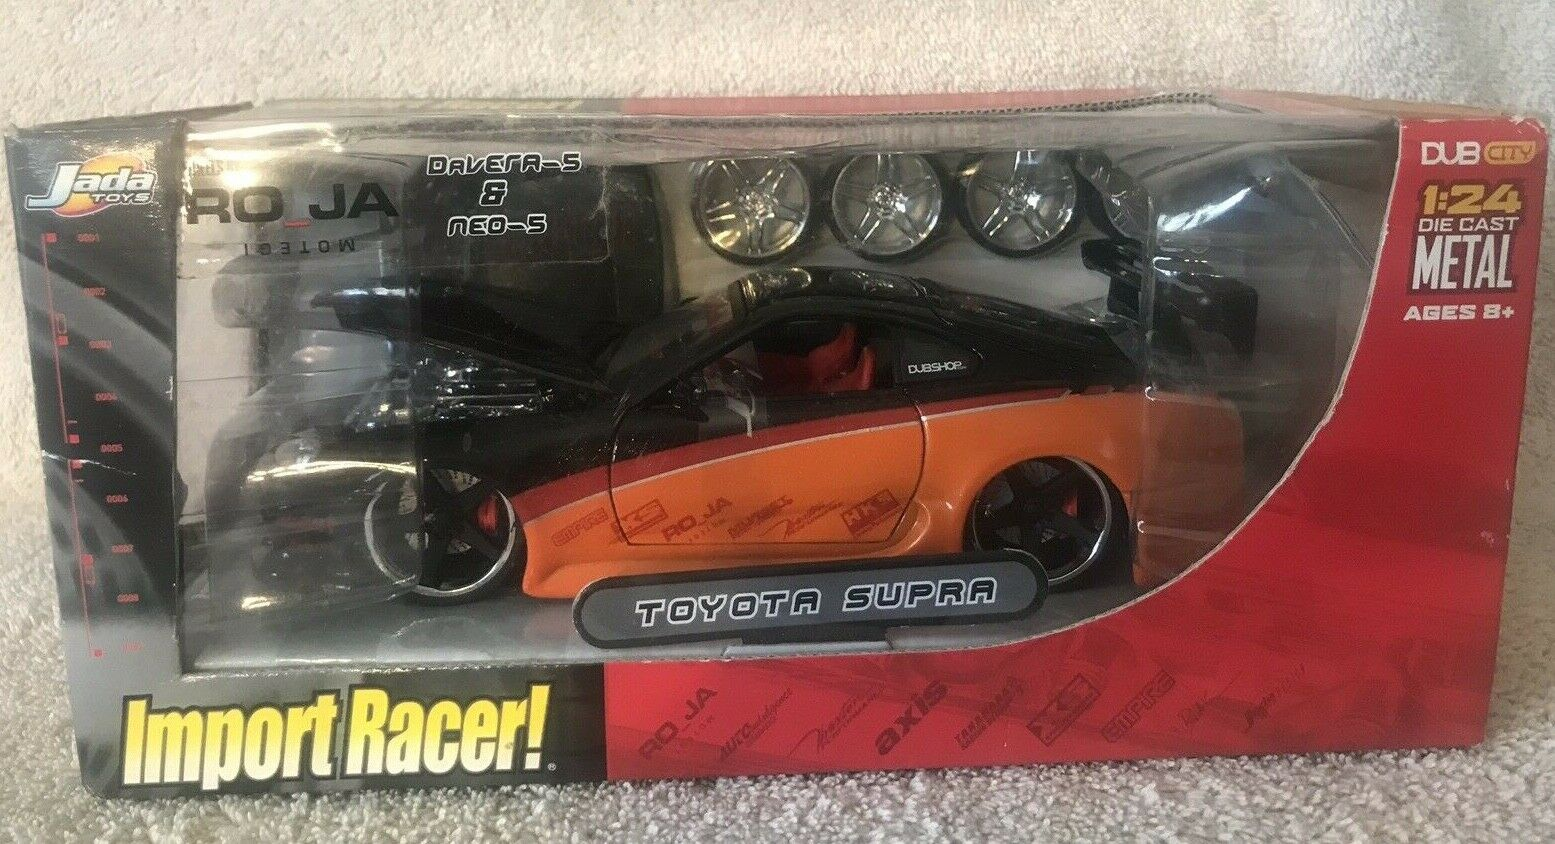 Import Racer  Toyota Supra  Dub City  1 24 Diecast Metal Jada Toys NIB VHTF RARE